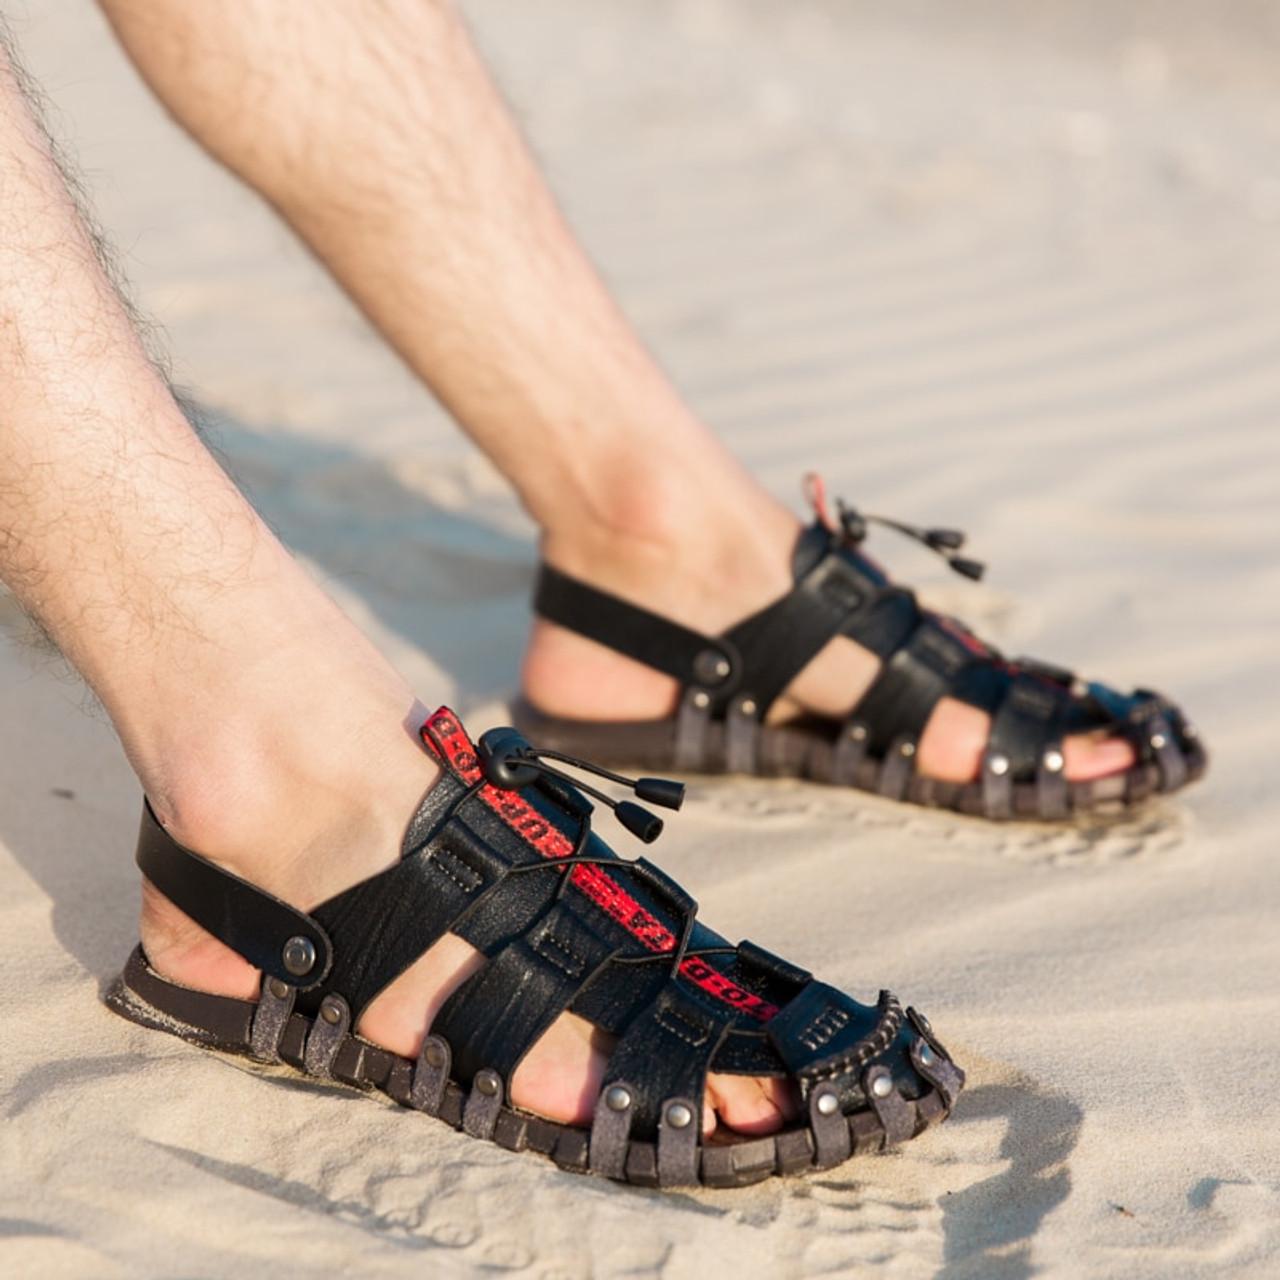 01c9bf124d89 ... BIMUDUIYU 2019 New Sandals Men Shoes Closed Toe Beach Lightweight  Slippers Sandals Classic Roman Sandals Outdoor ...